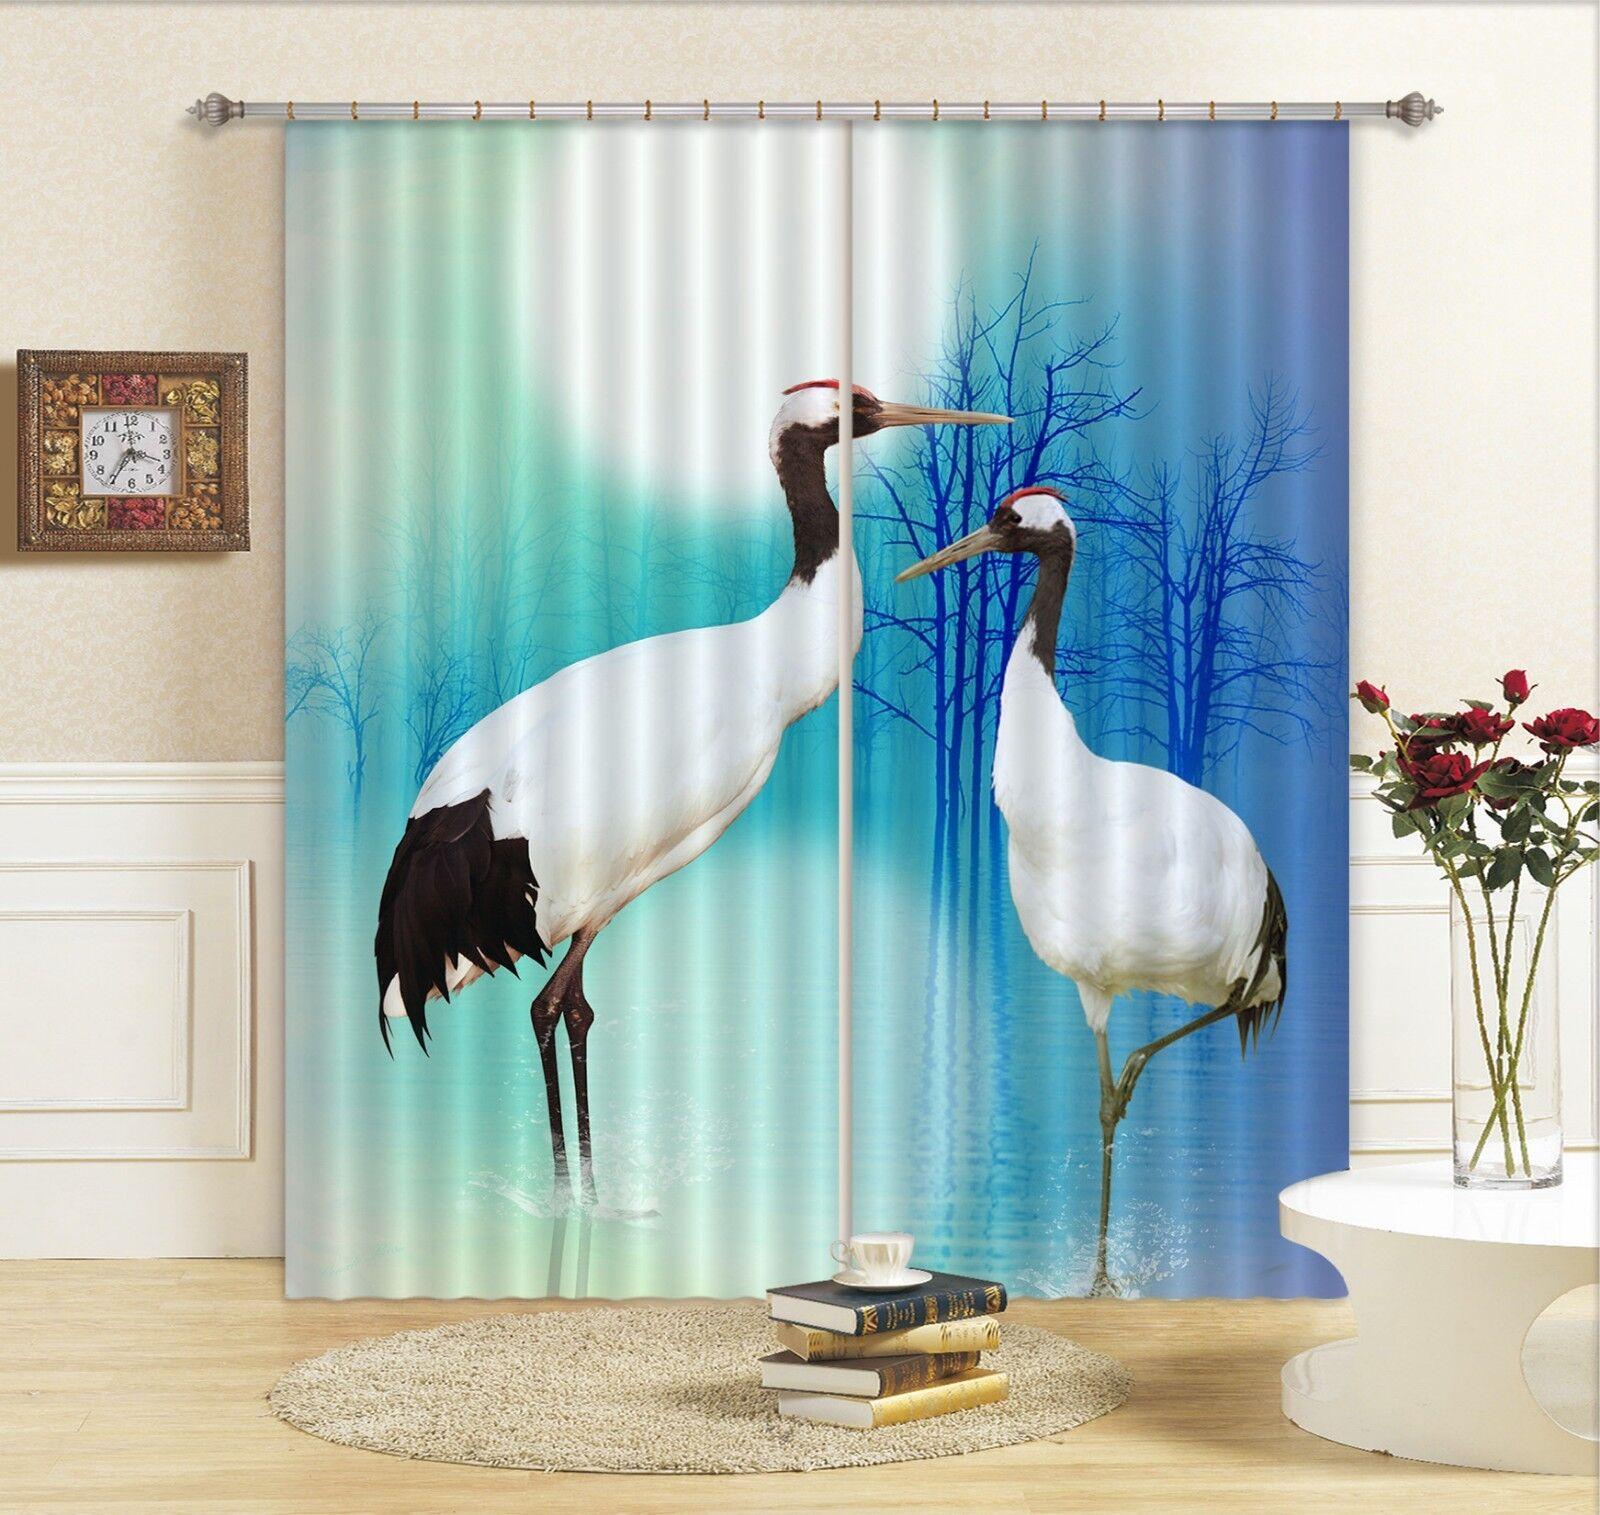 3D Moon Heron 678 Blockout Photo Curtain Print Curtains Drapes Fabric Window AU